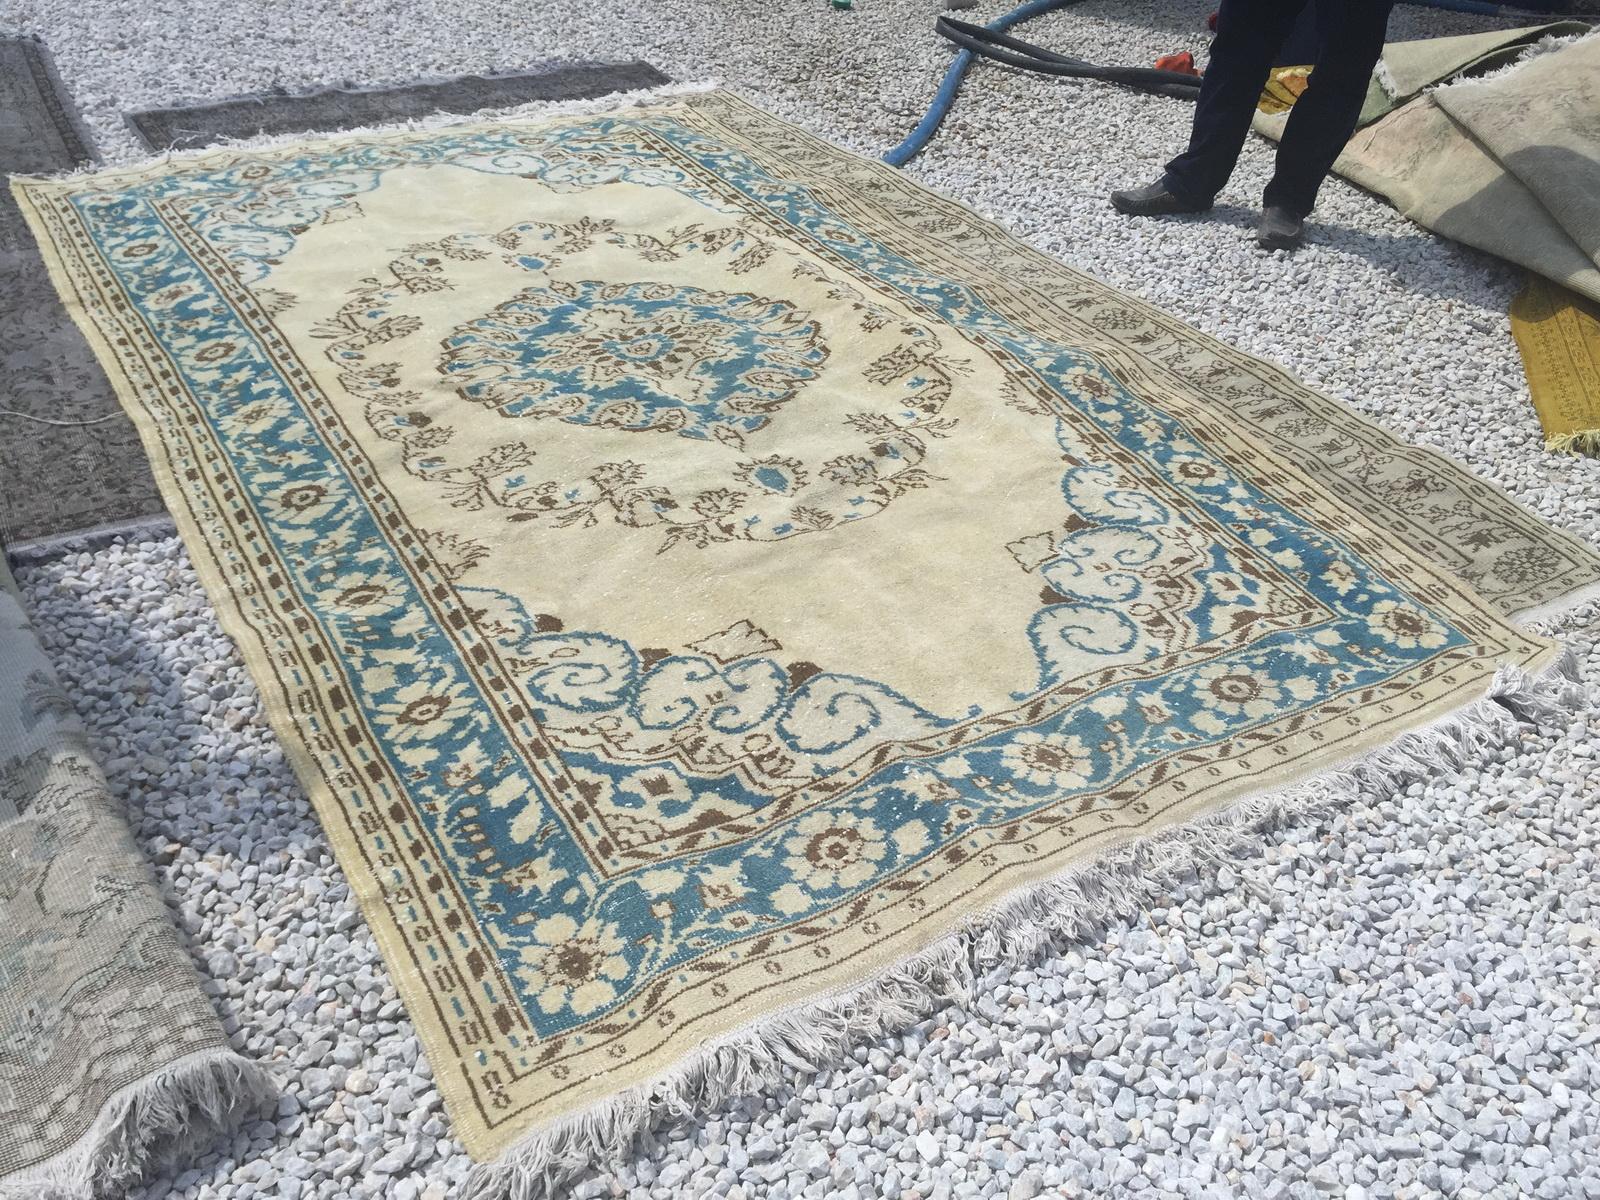 VERKOCHT blauw met zandkleur vintage vloerkleed nr 4782 (290cm x 181cm)  Dit kleed wordt rond 22 augustus in Nederland verwacht